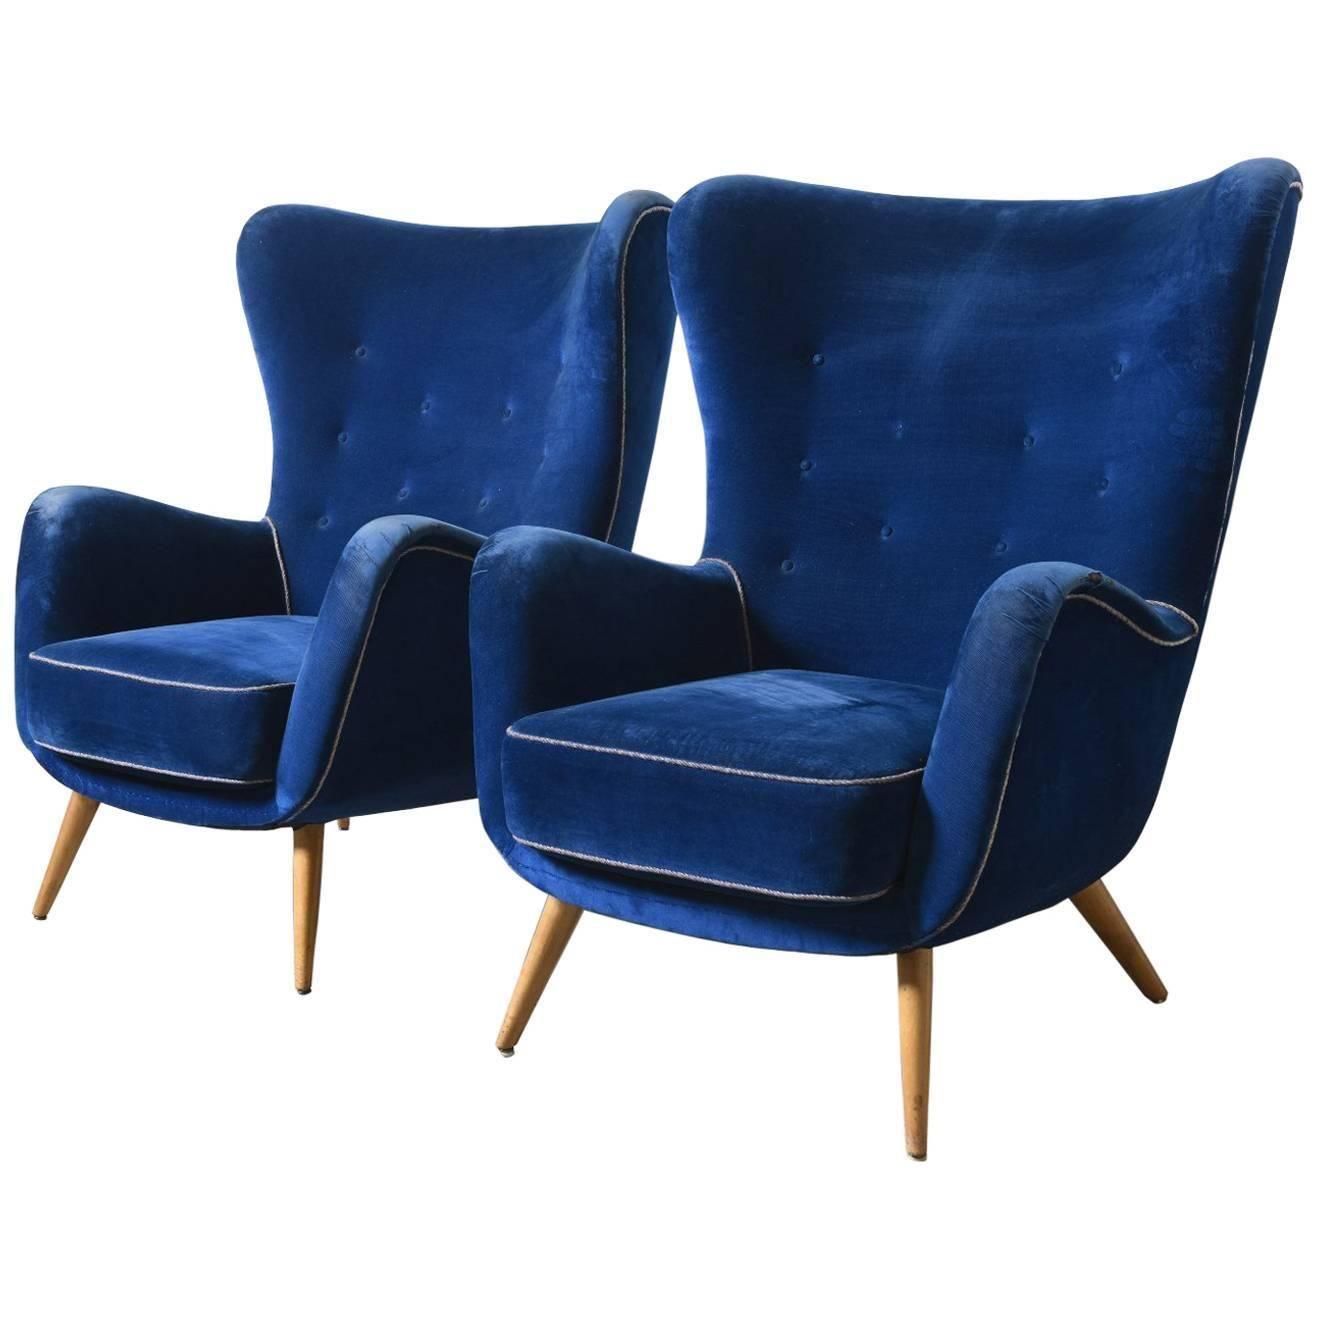 Set Of Two Large Italian Blue Velvet Wing Back Easy Chair By